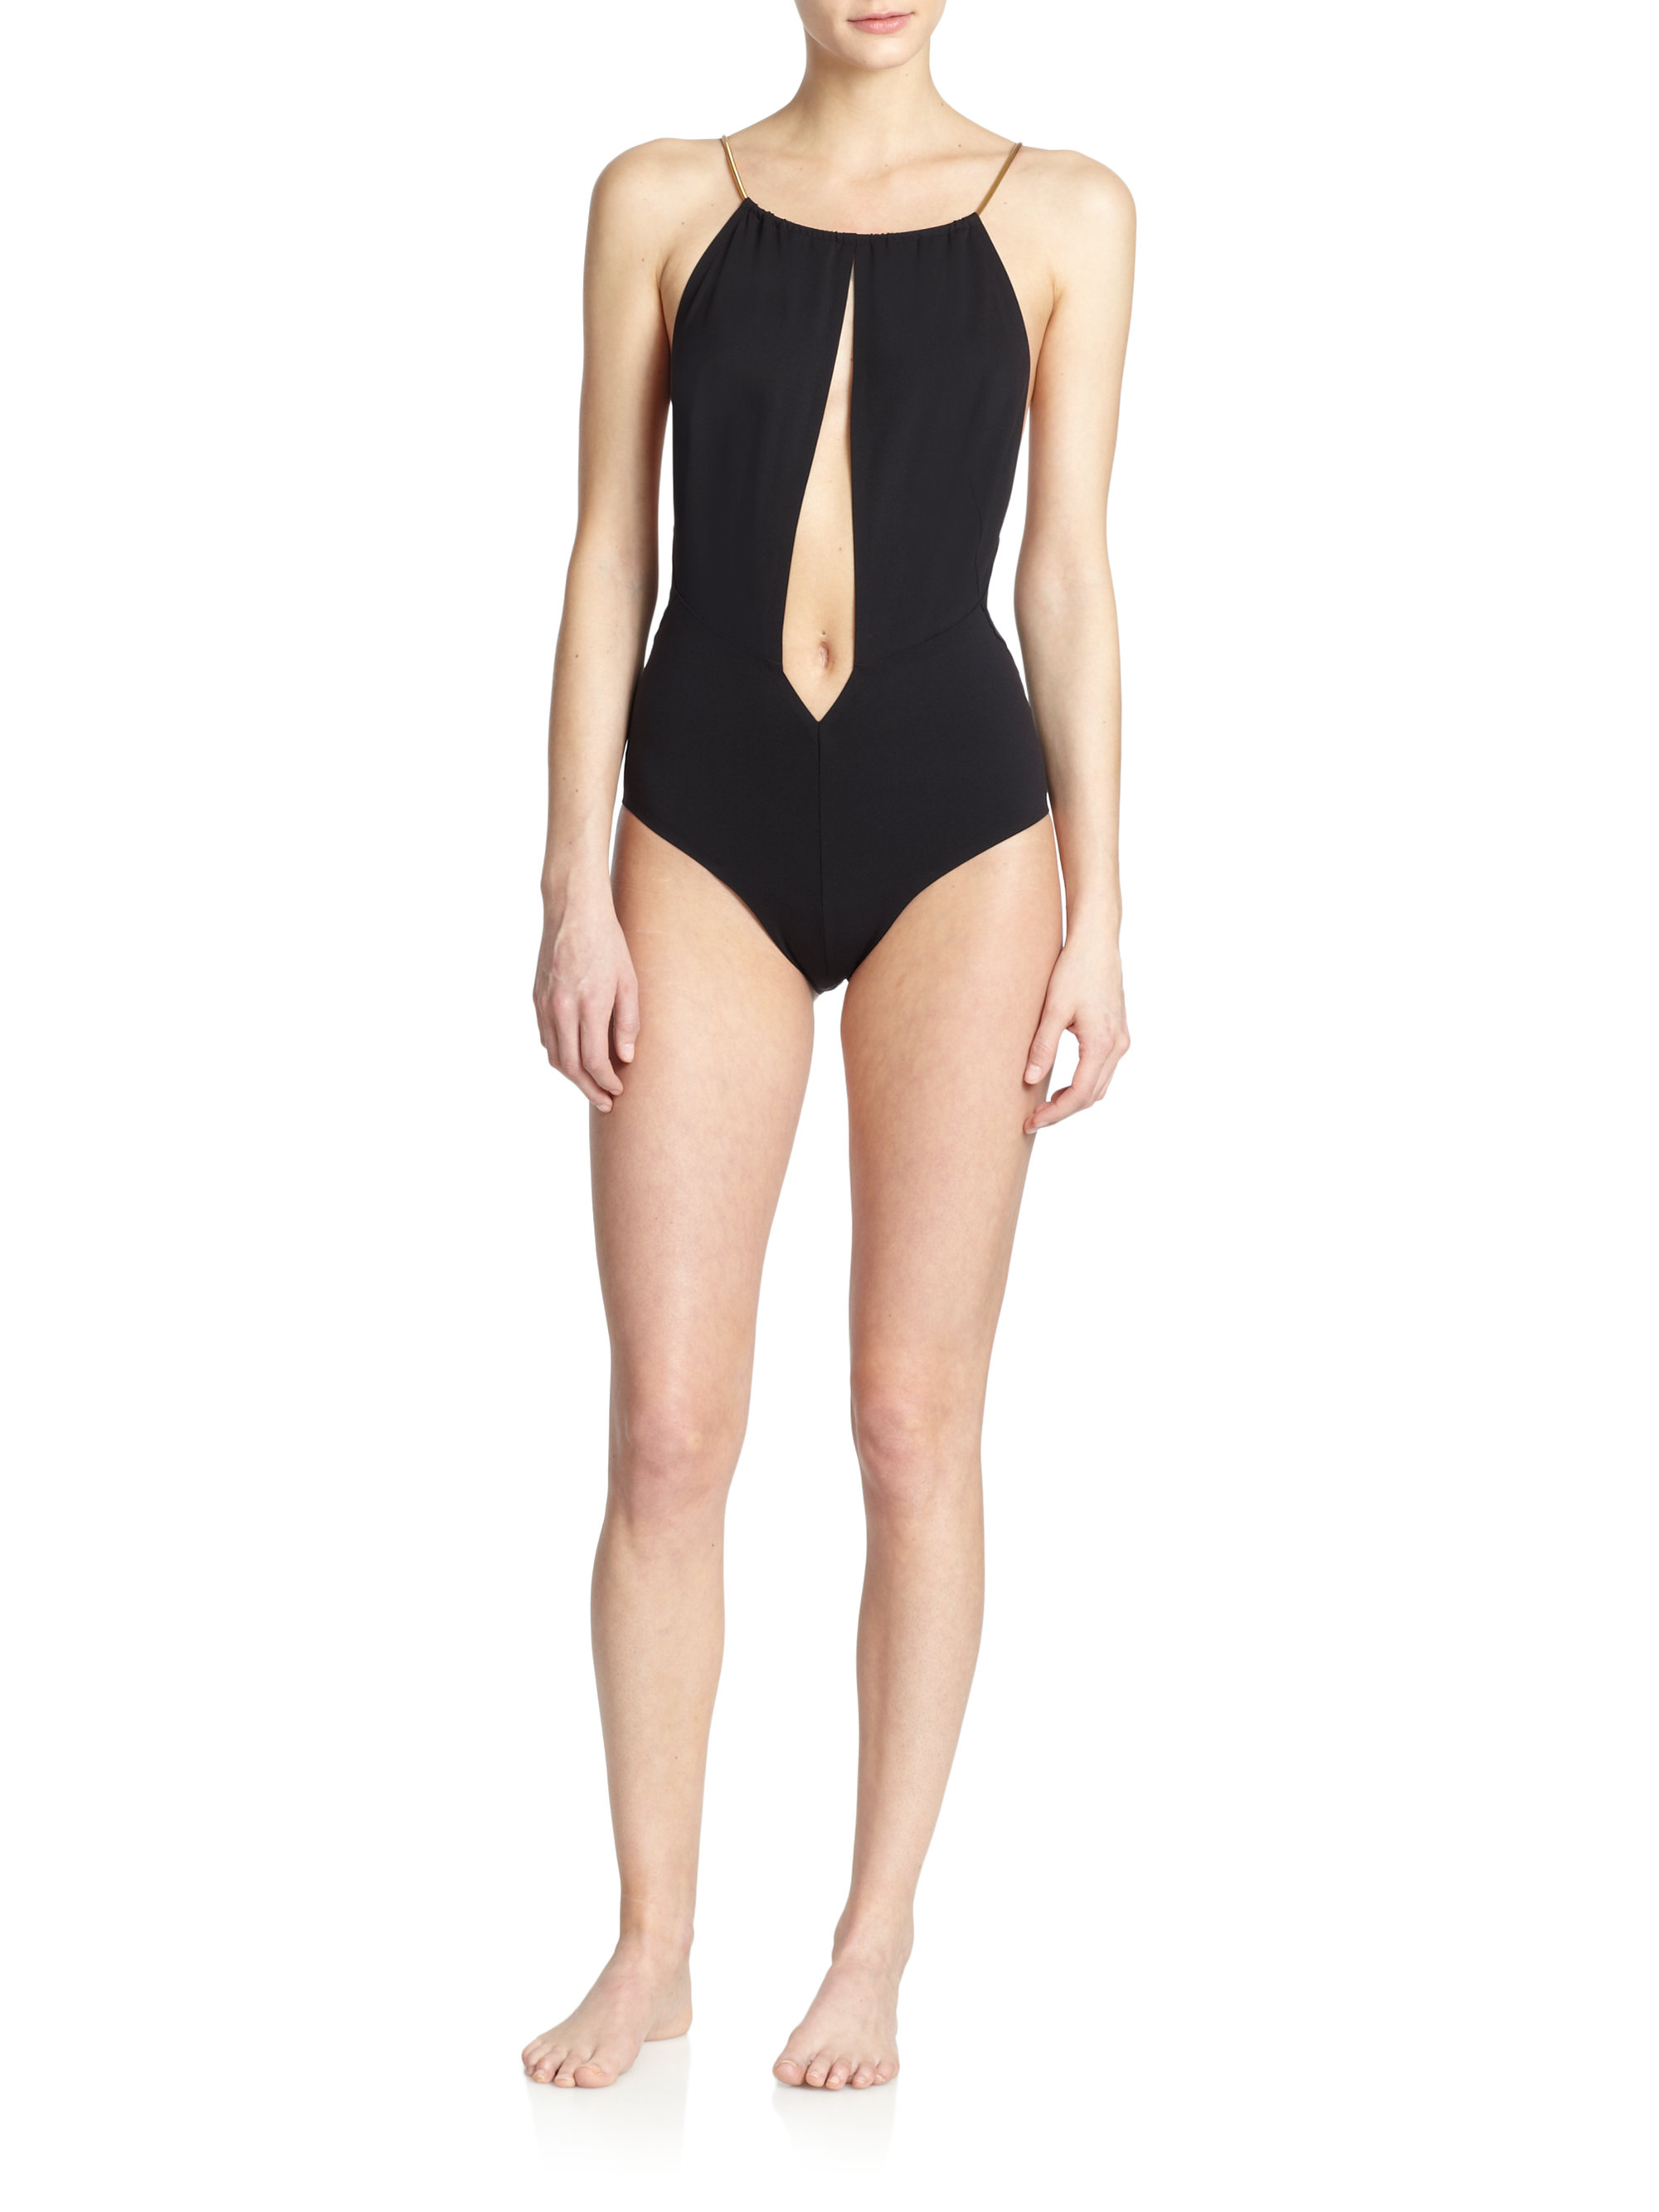 40edadbf8fa La Perla One-piece Eclipse Plunge Swimsuit in Black - Lyst